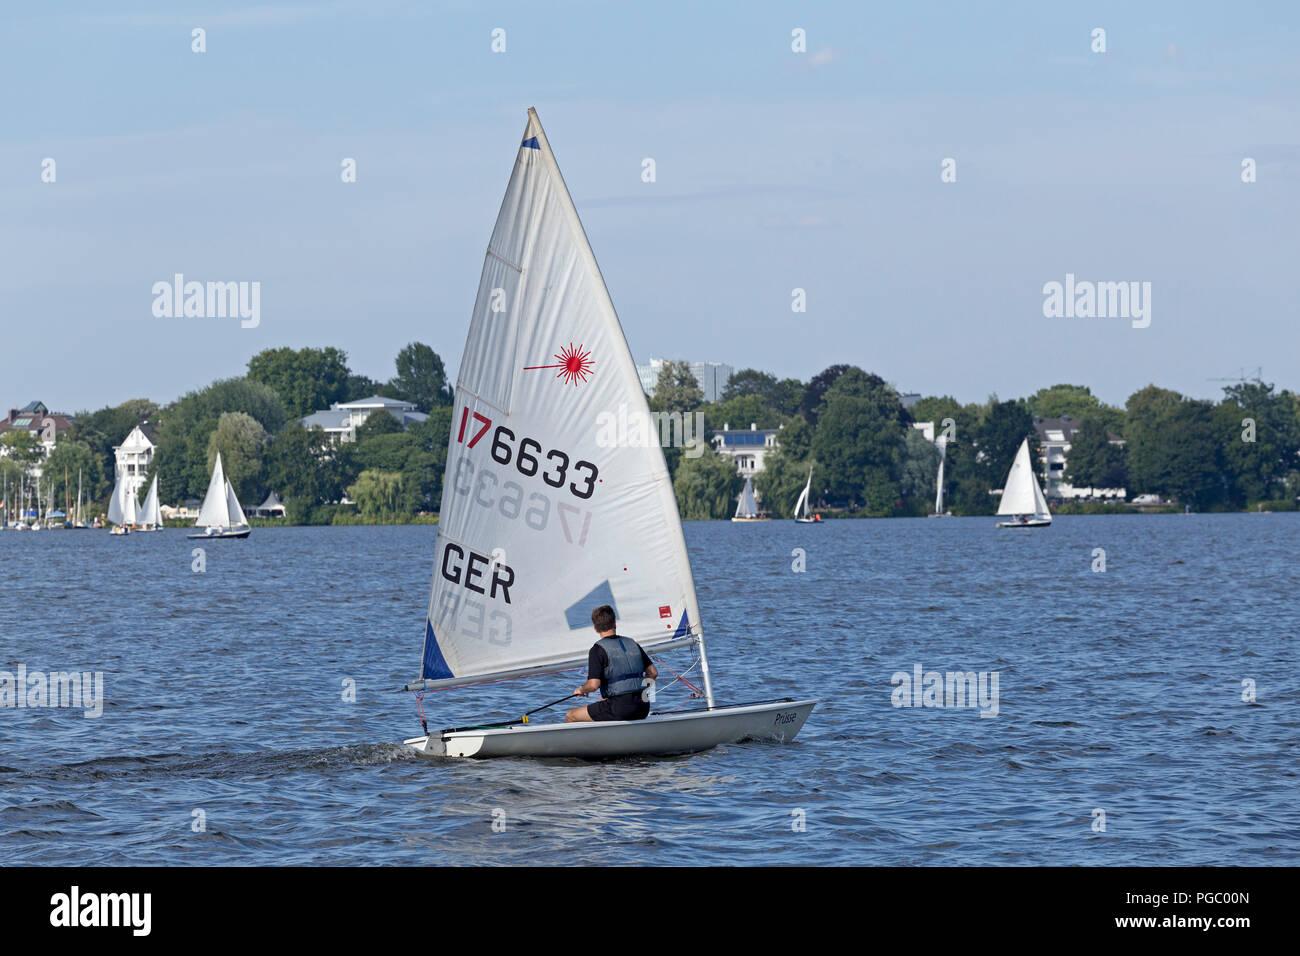 sailing boat, lake Außenalster (Outer Alster), Hamburg, Germany - Stock Image